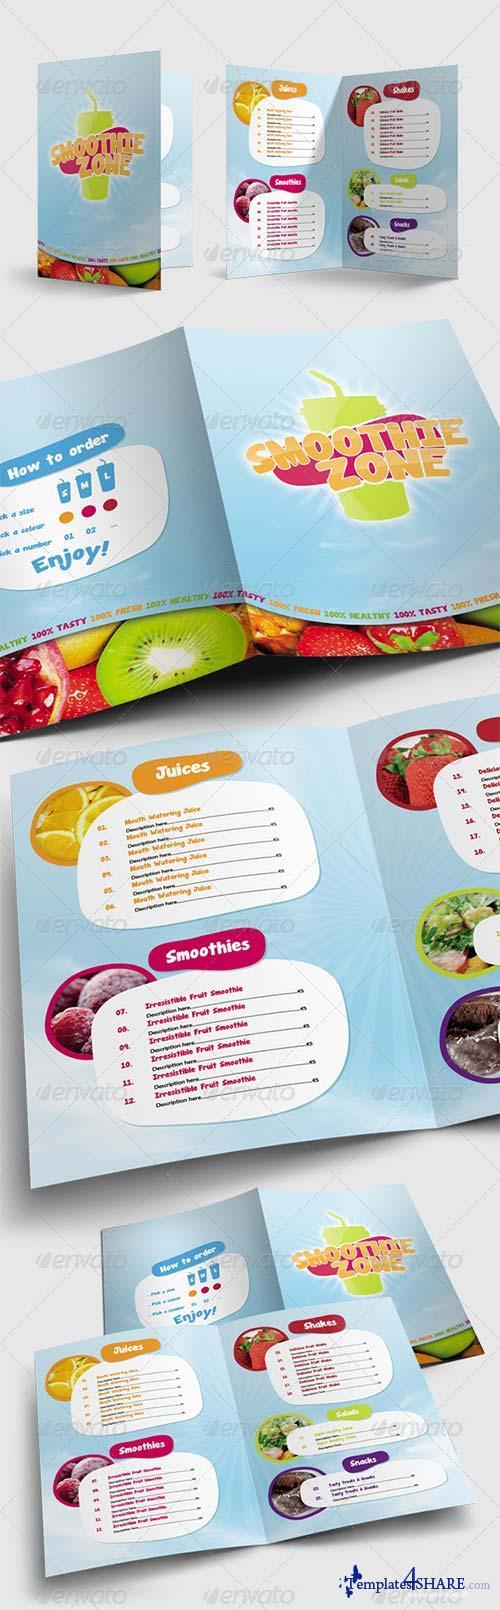 GraphicRiver Juice and Smoothie Menu - Smoothie Zone